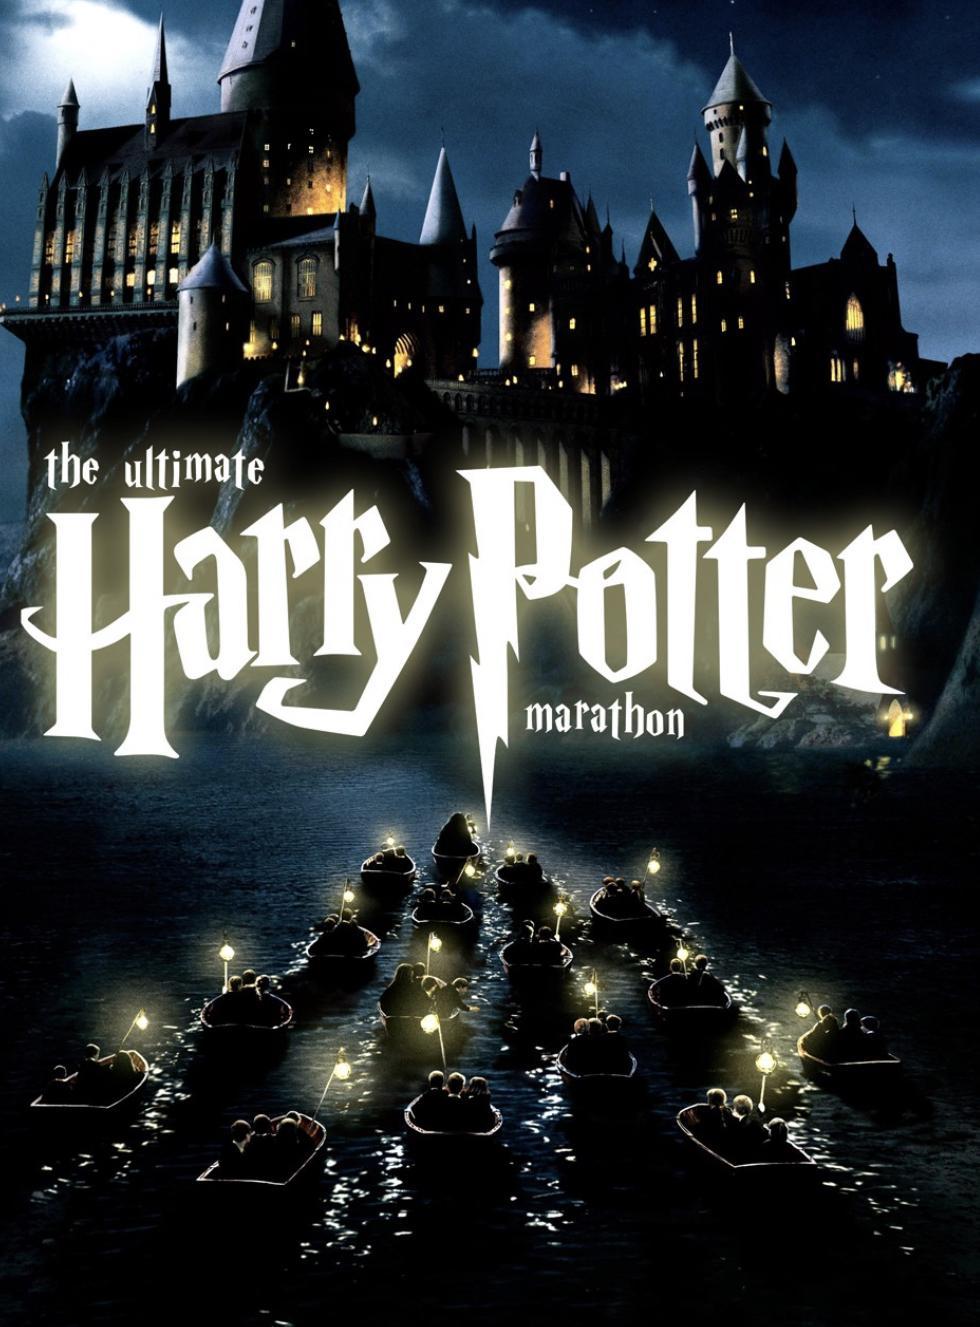 Harry Potter Movie Marathon at Doc's Drive in Theatre - 7 MAR 2020